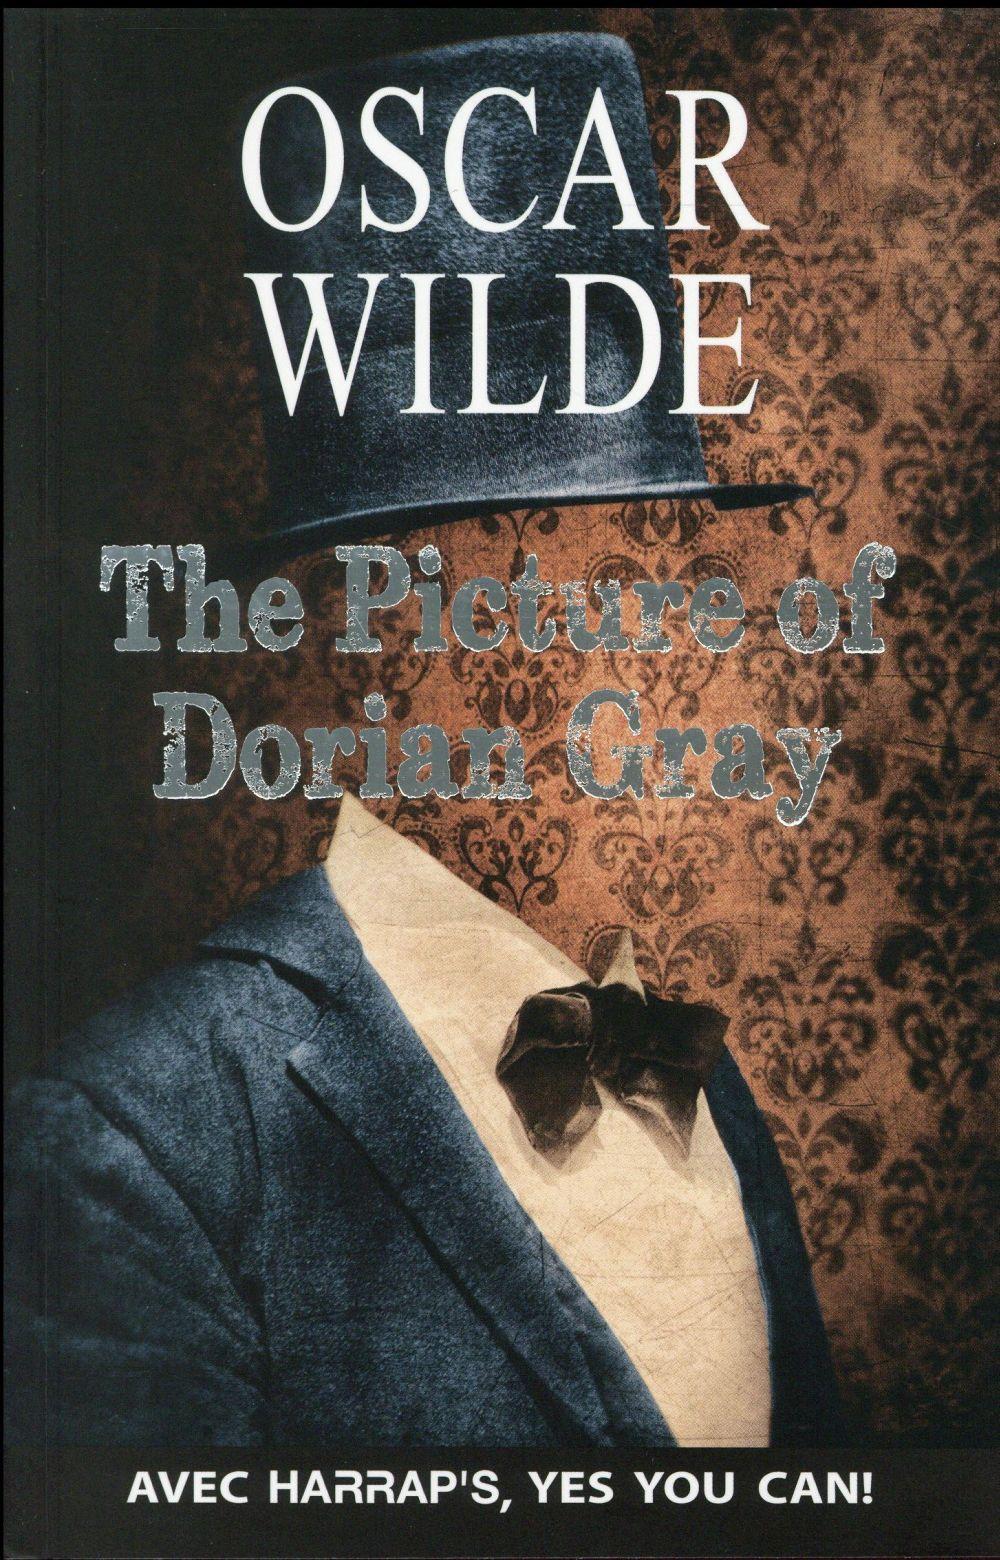 HARRAP'S THE PICTURE OF DORIAN GRAY Wilde Oscar Harrap 's